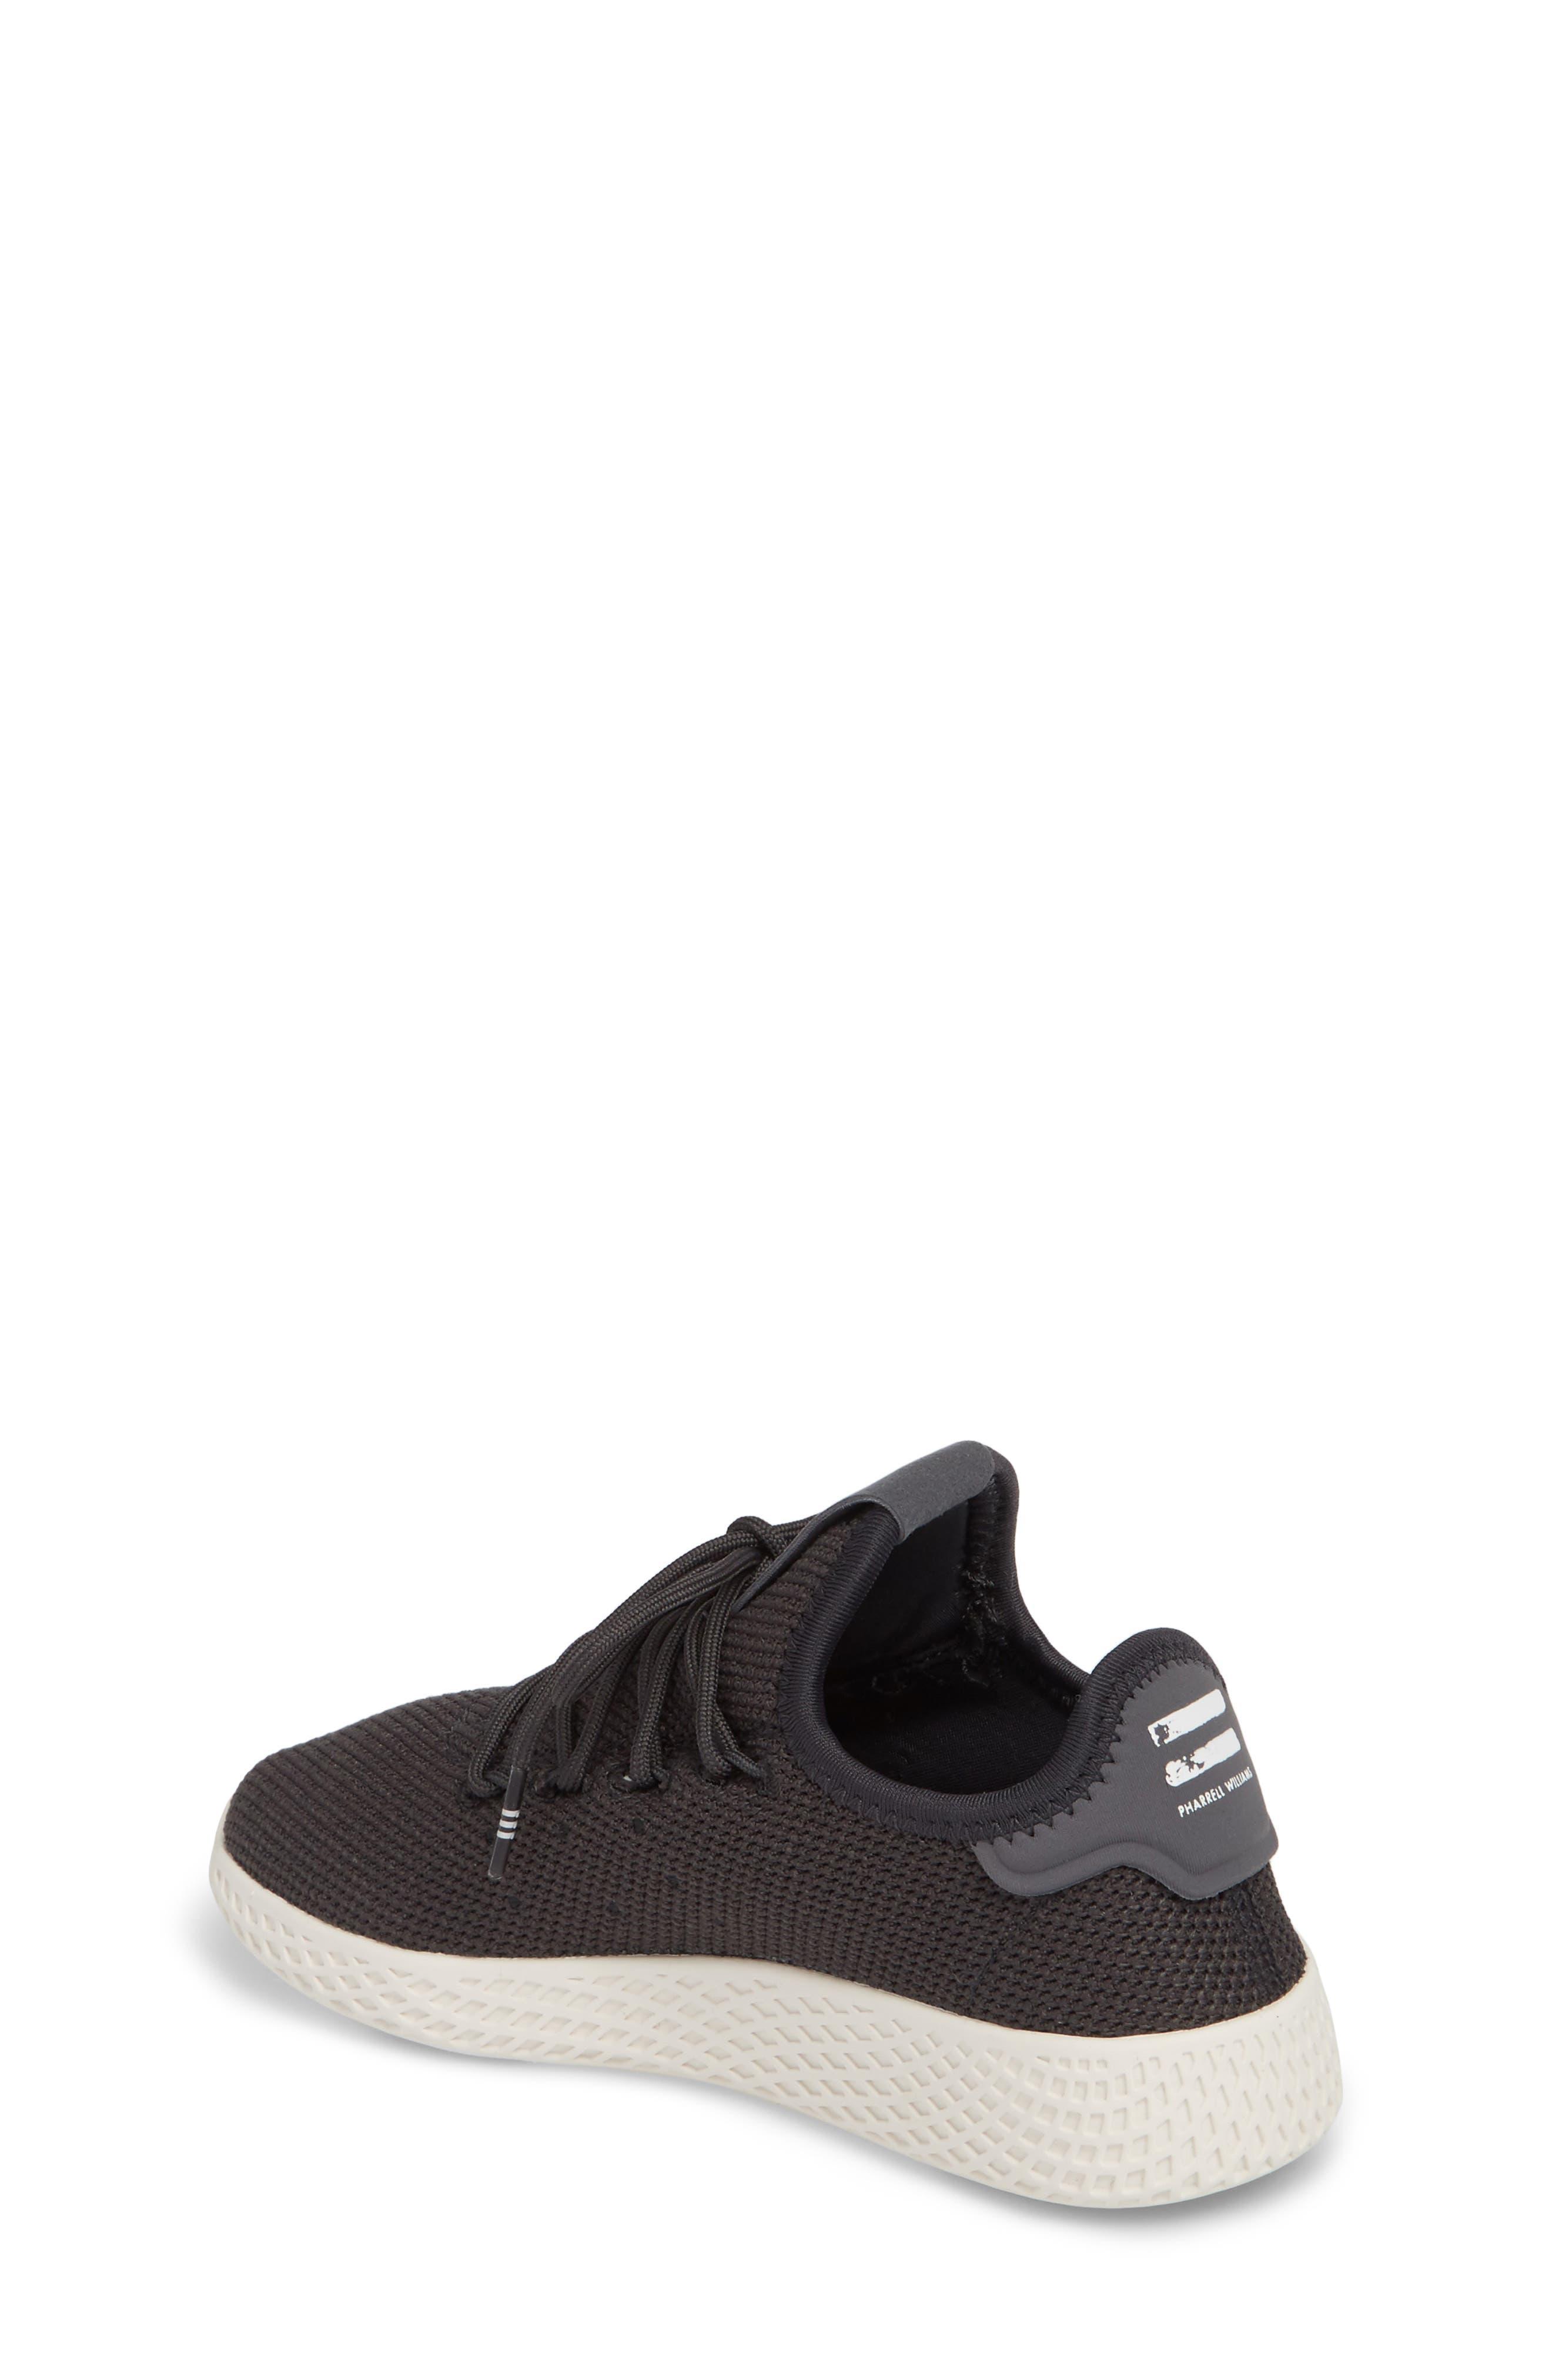 Pharrell Williams Tennis Hu Sock Sneaker,                             Alternate thumbnail 2, color,                             020